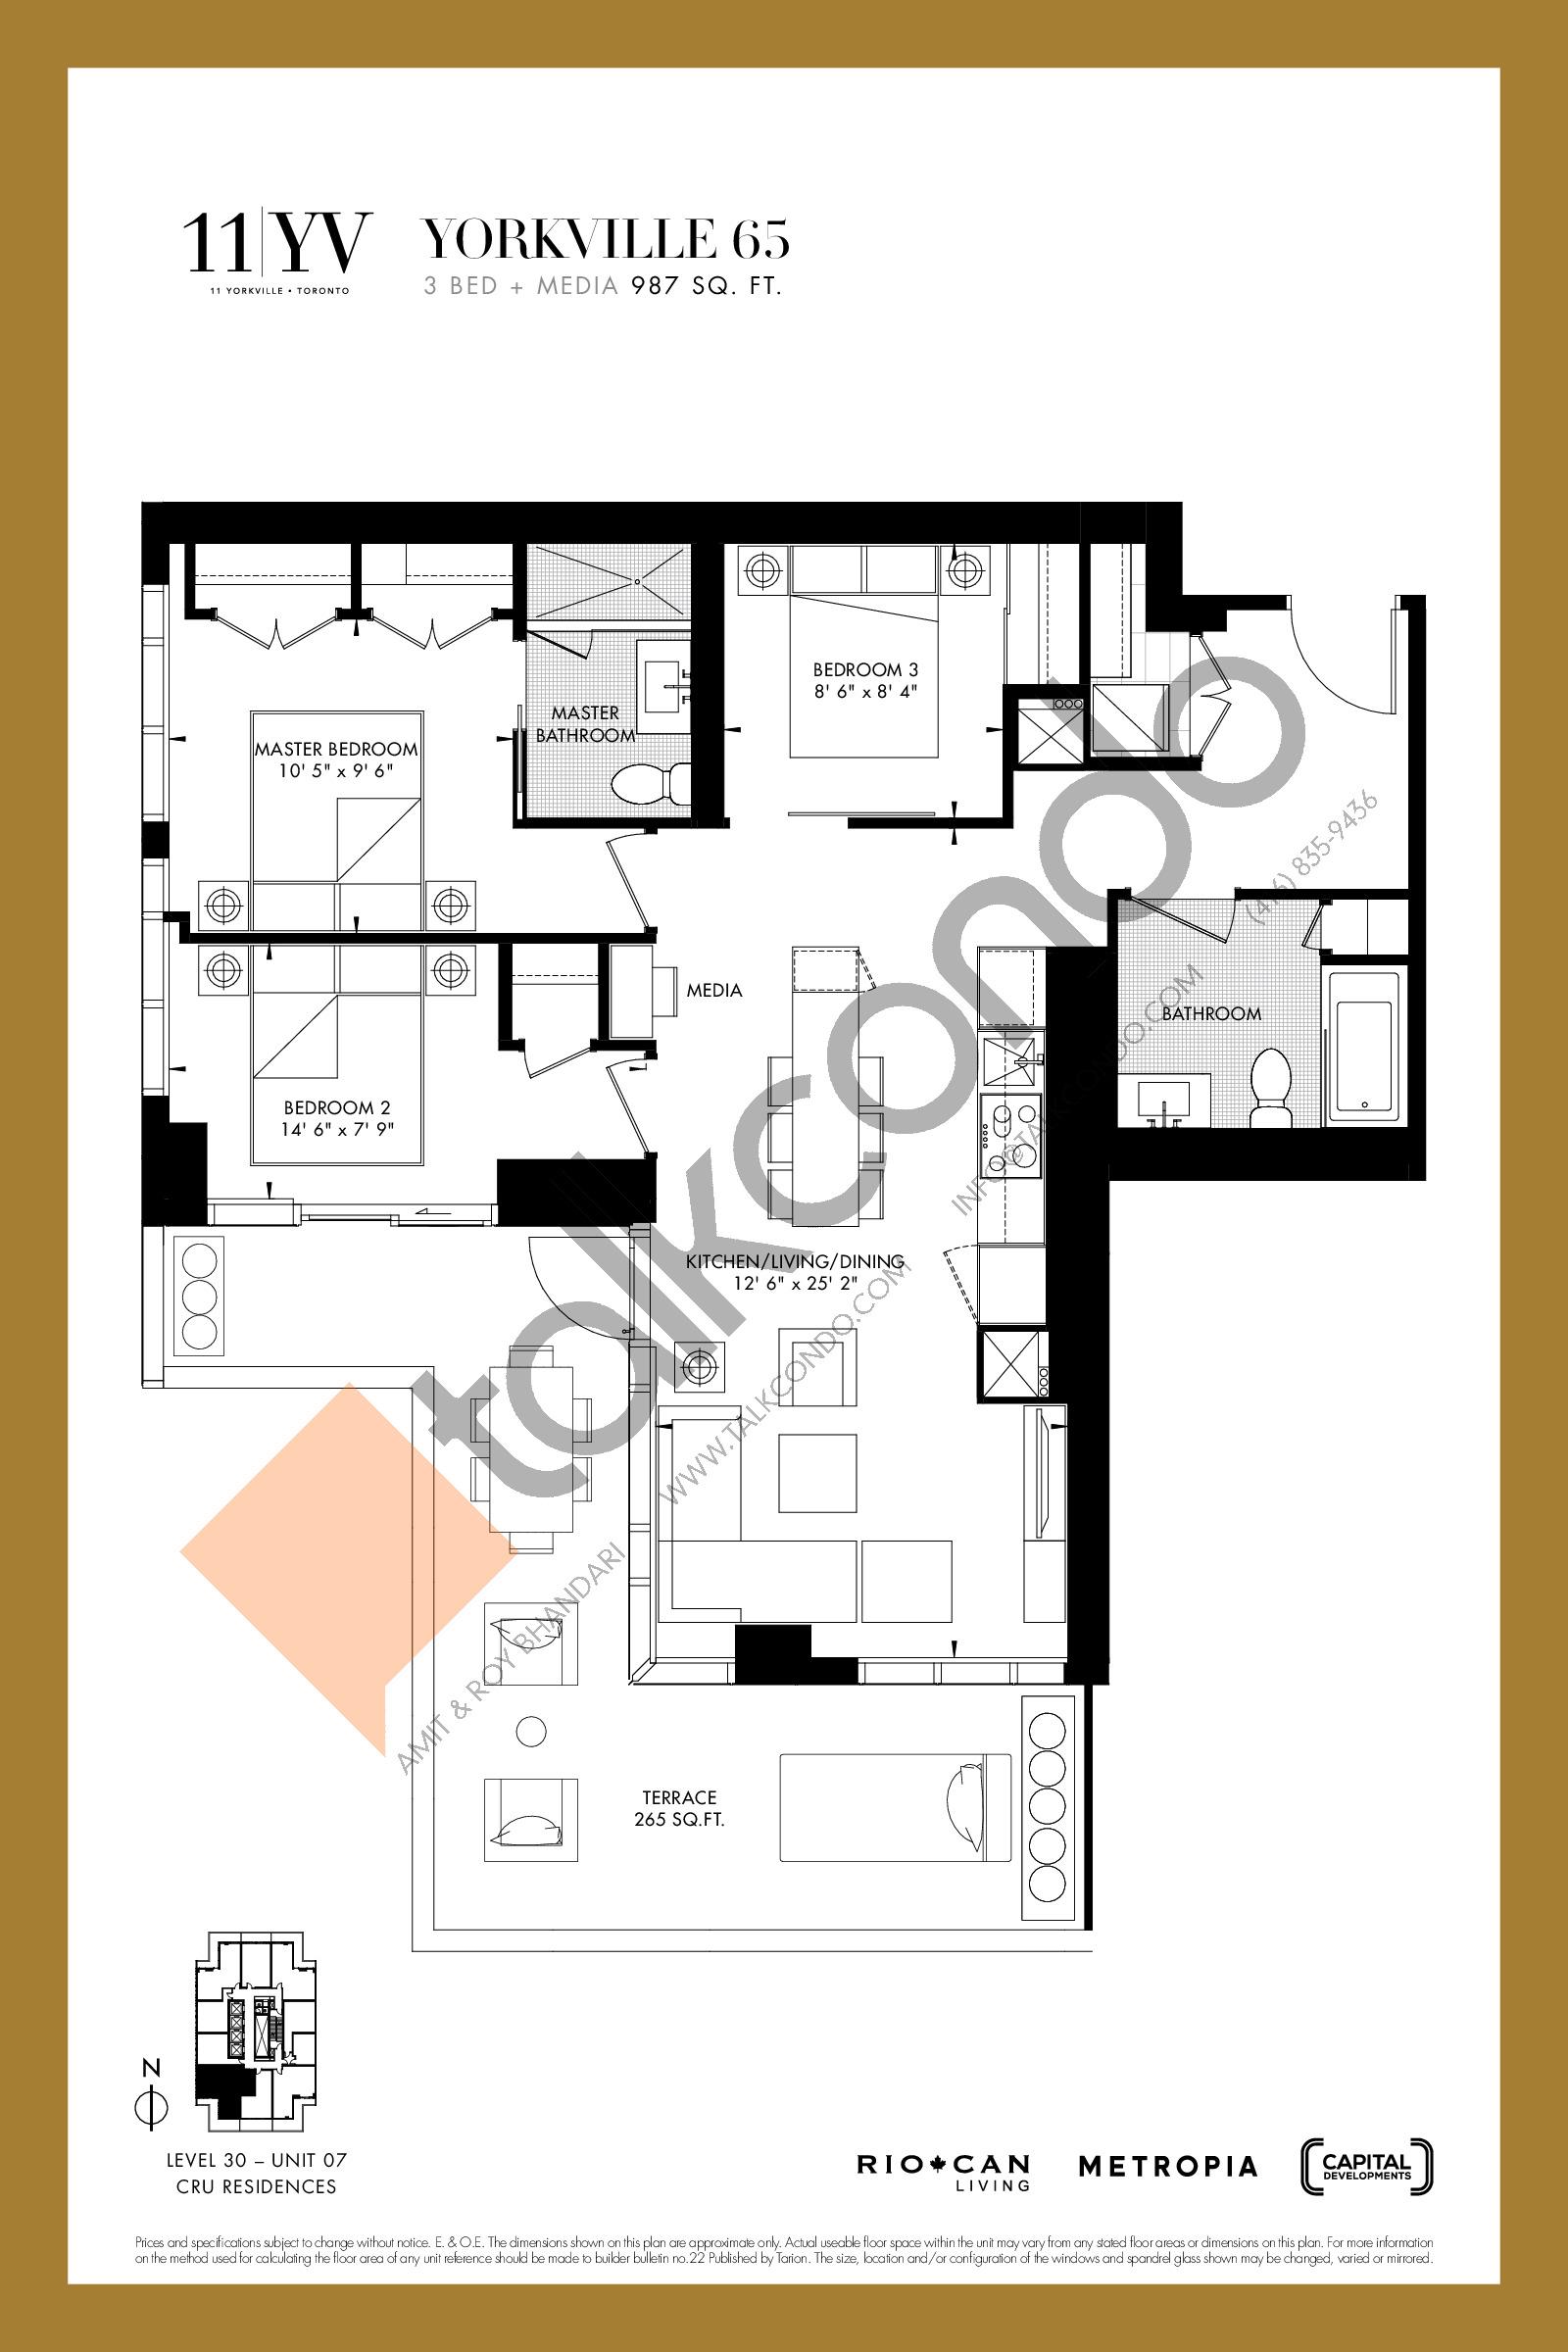 Yorkville 65 Floor Plan at 11YV Condos - 987 sq.ft